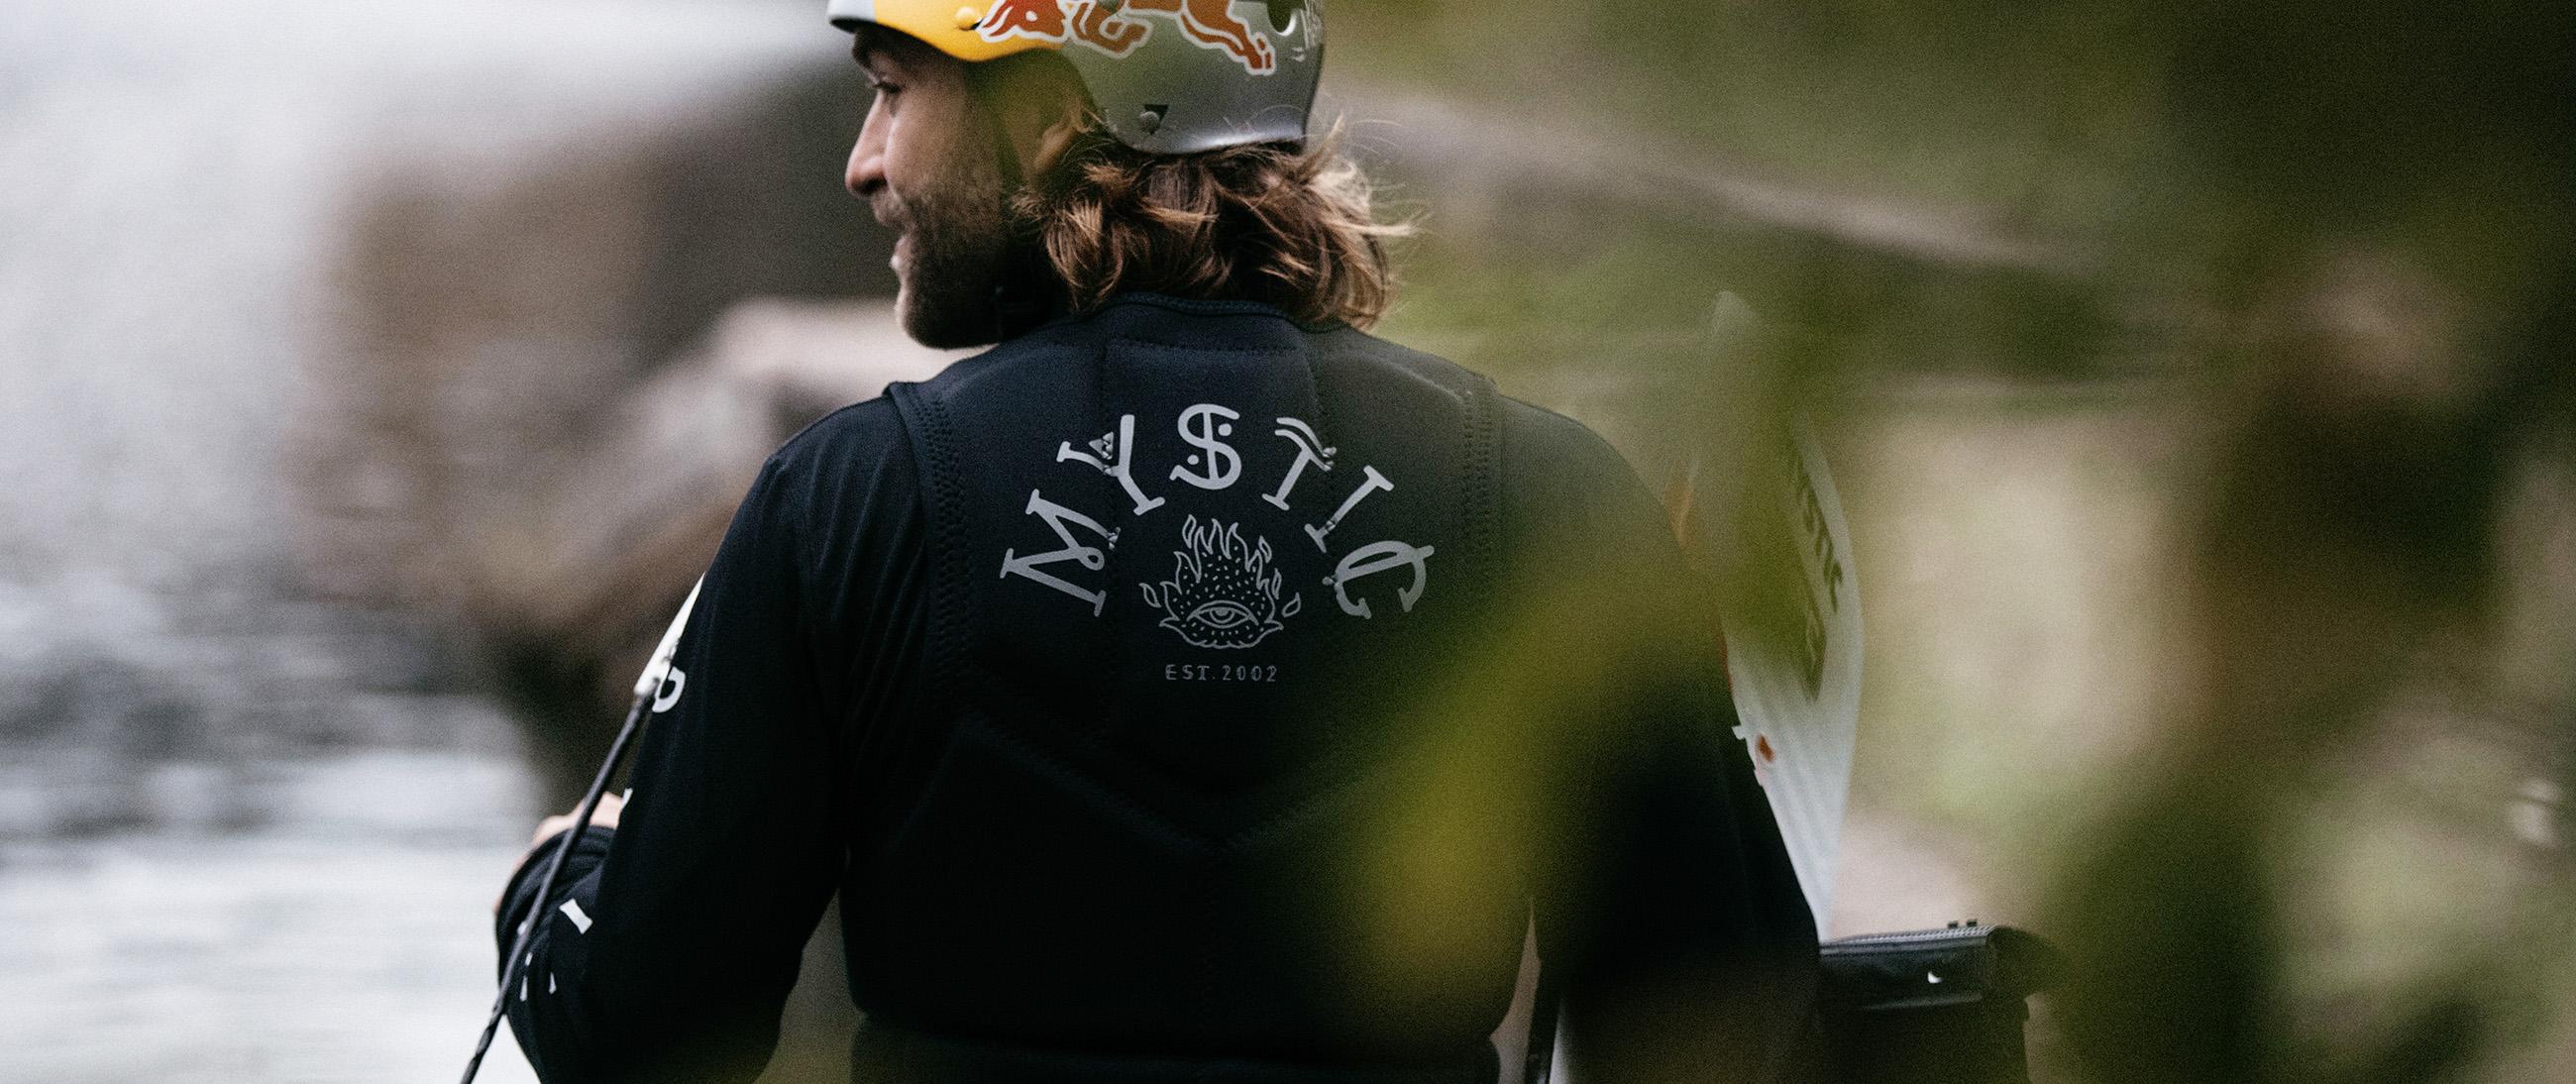 NEU MYSTIC The Dom Impact Vest;Dominik Hernler Signature Model jetzt verfügbar